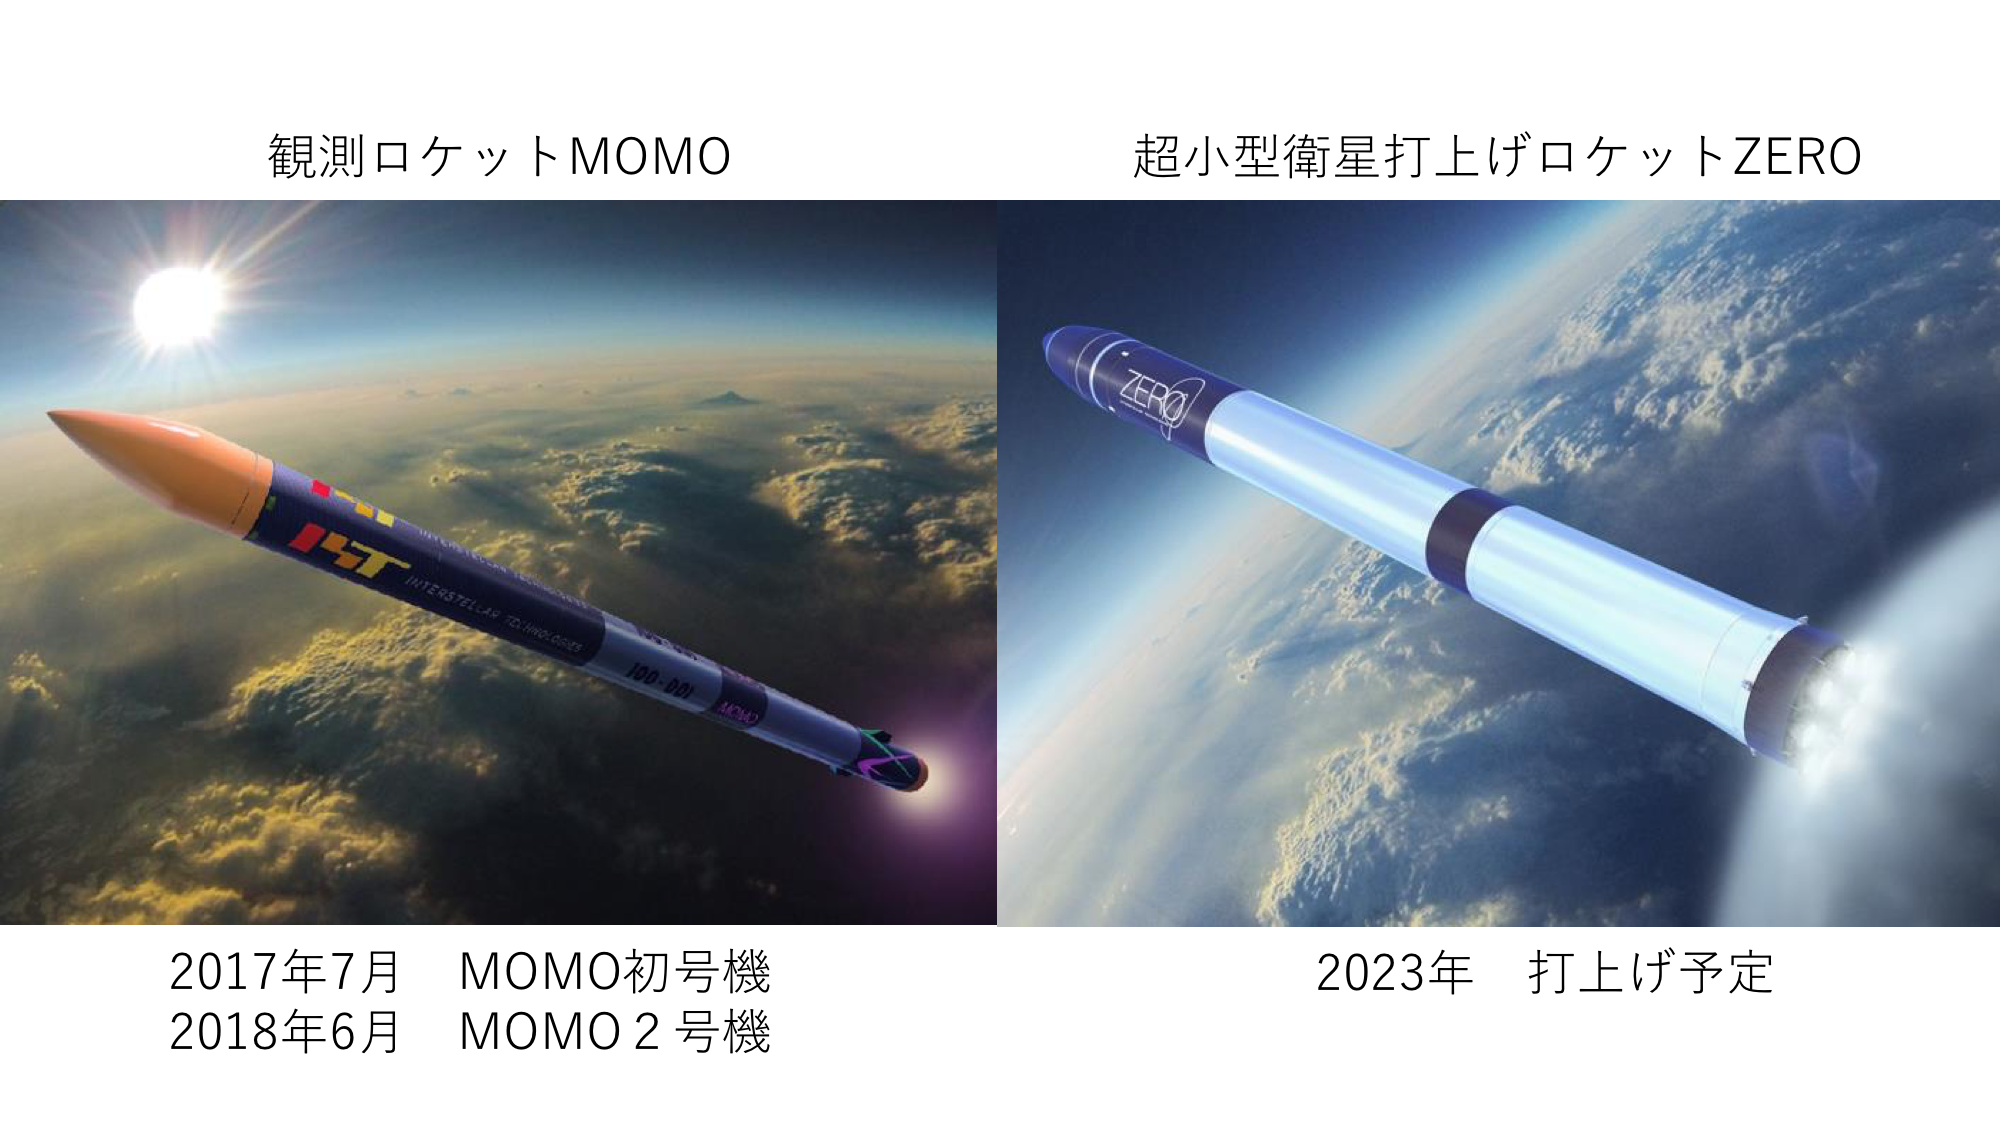 f:id:Imamura:20190414213949p:plain